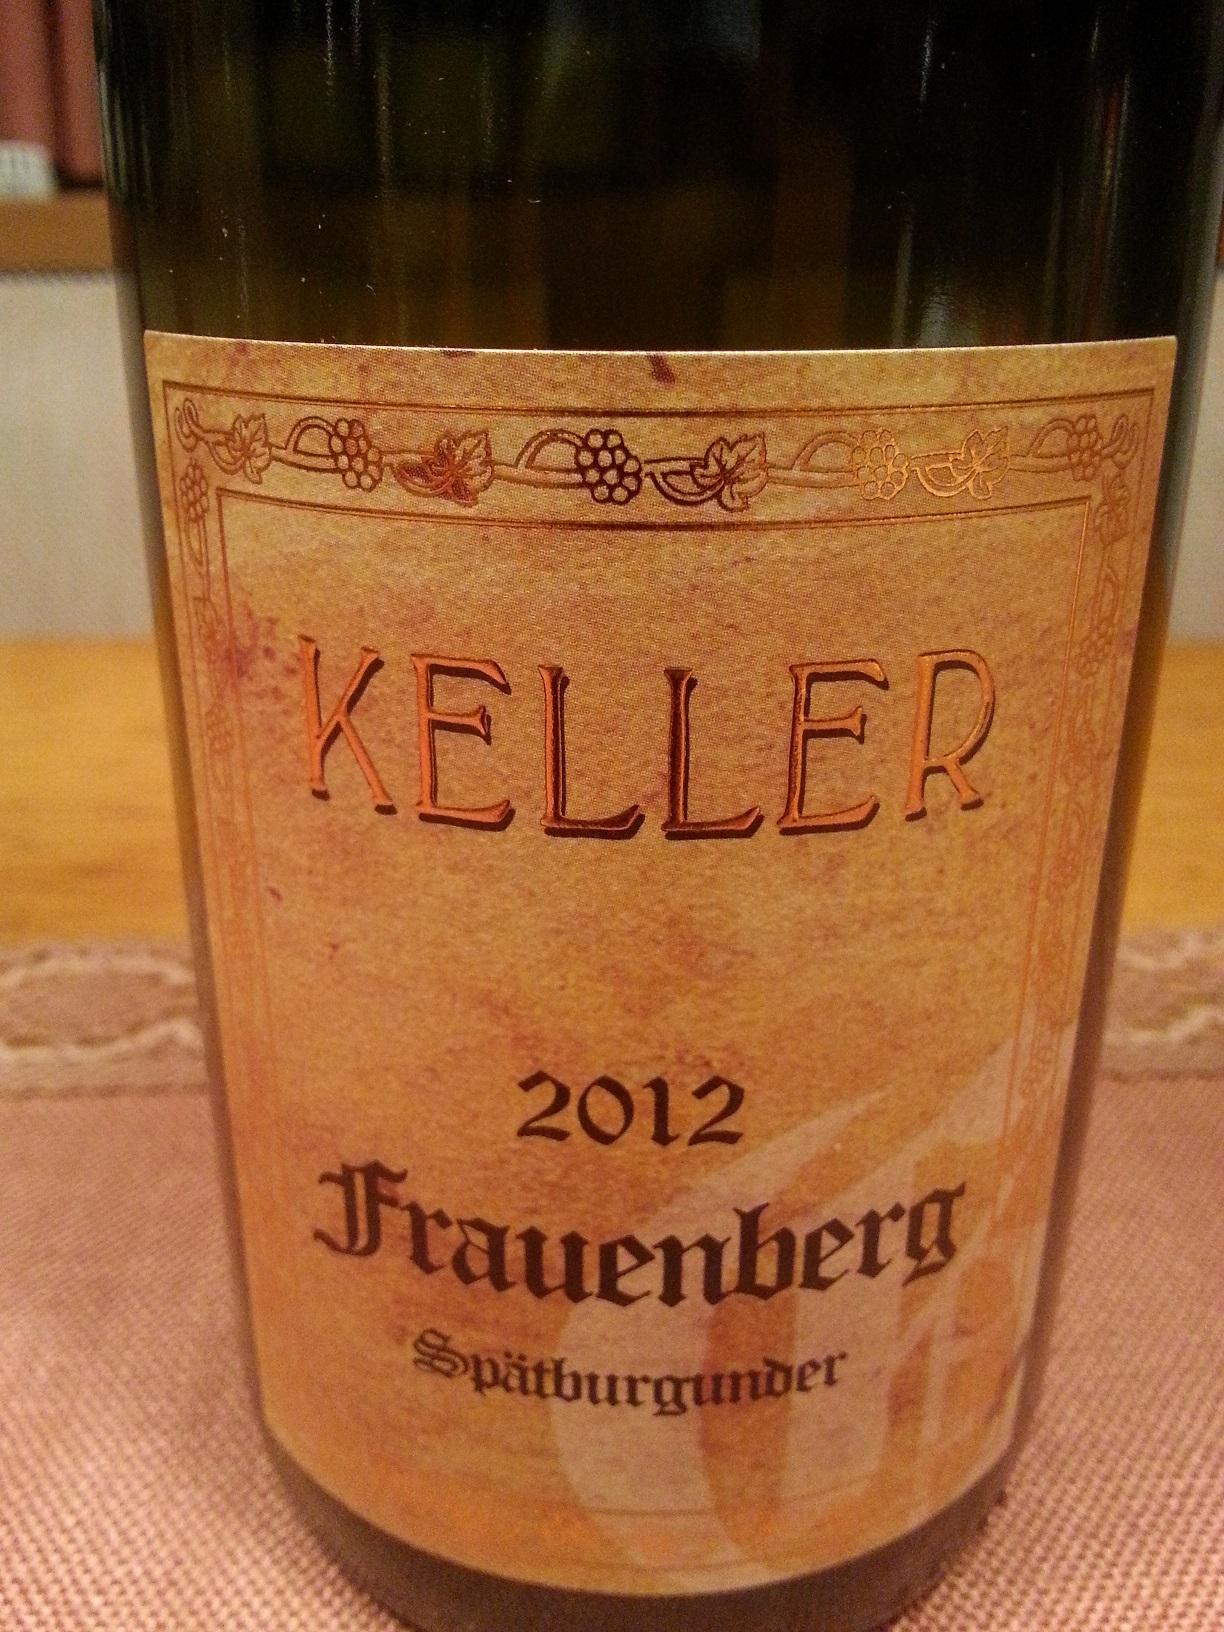 2012 Spätburgunder Frauenberg | Keller